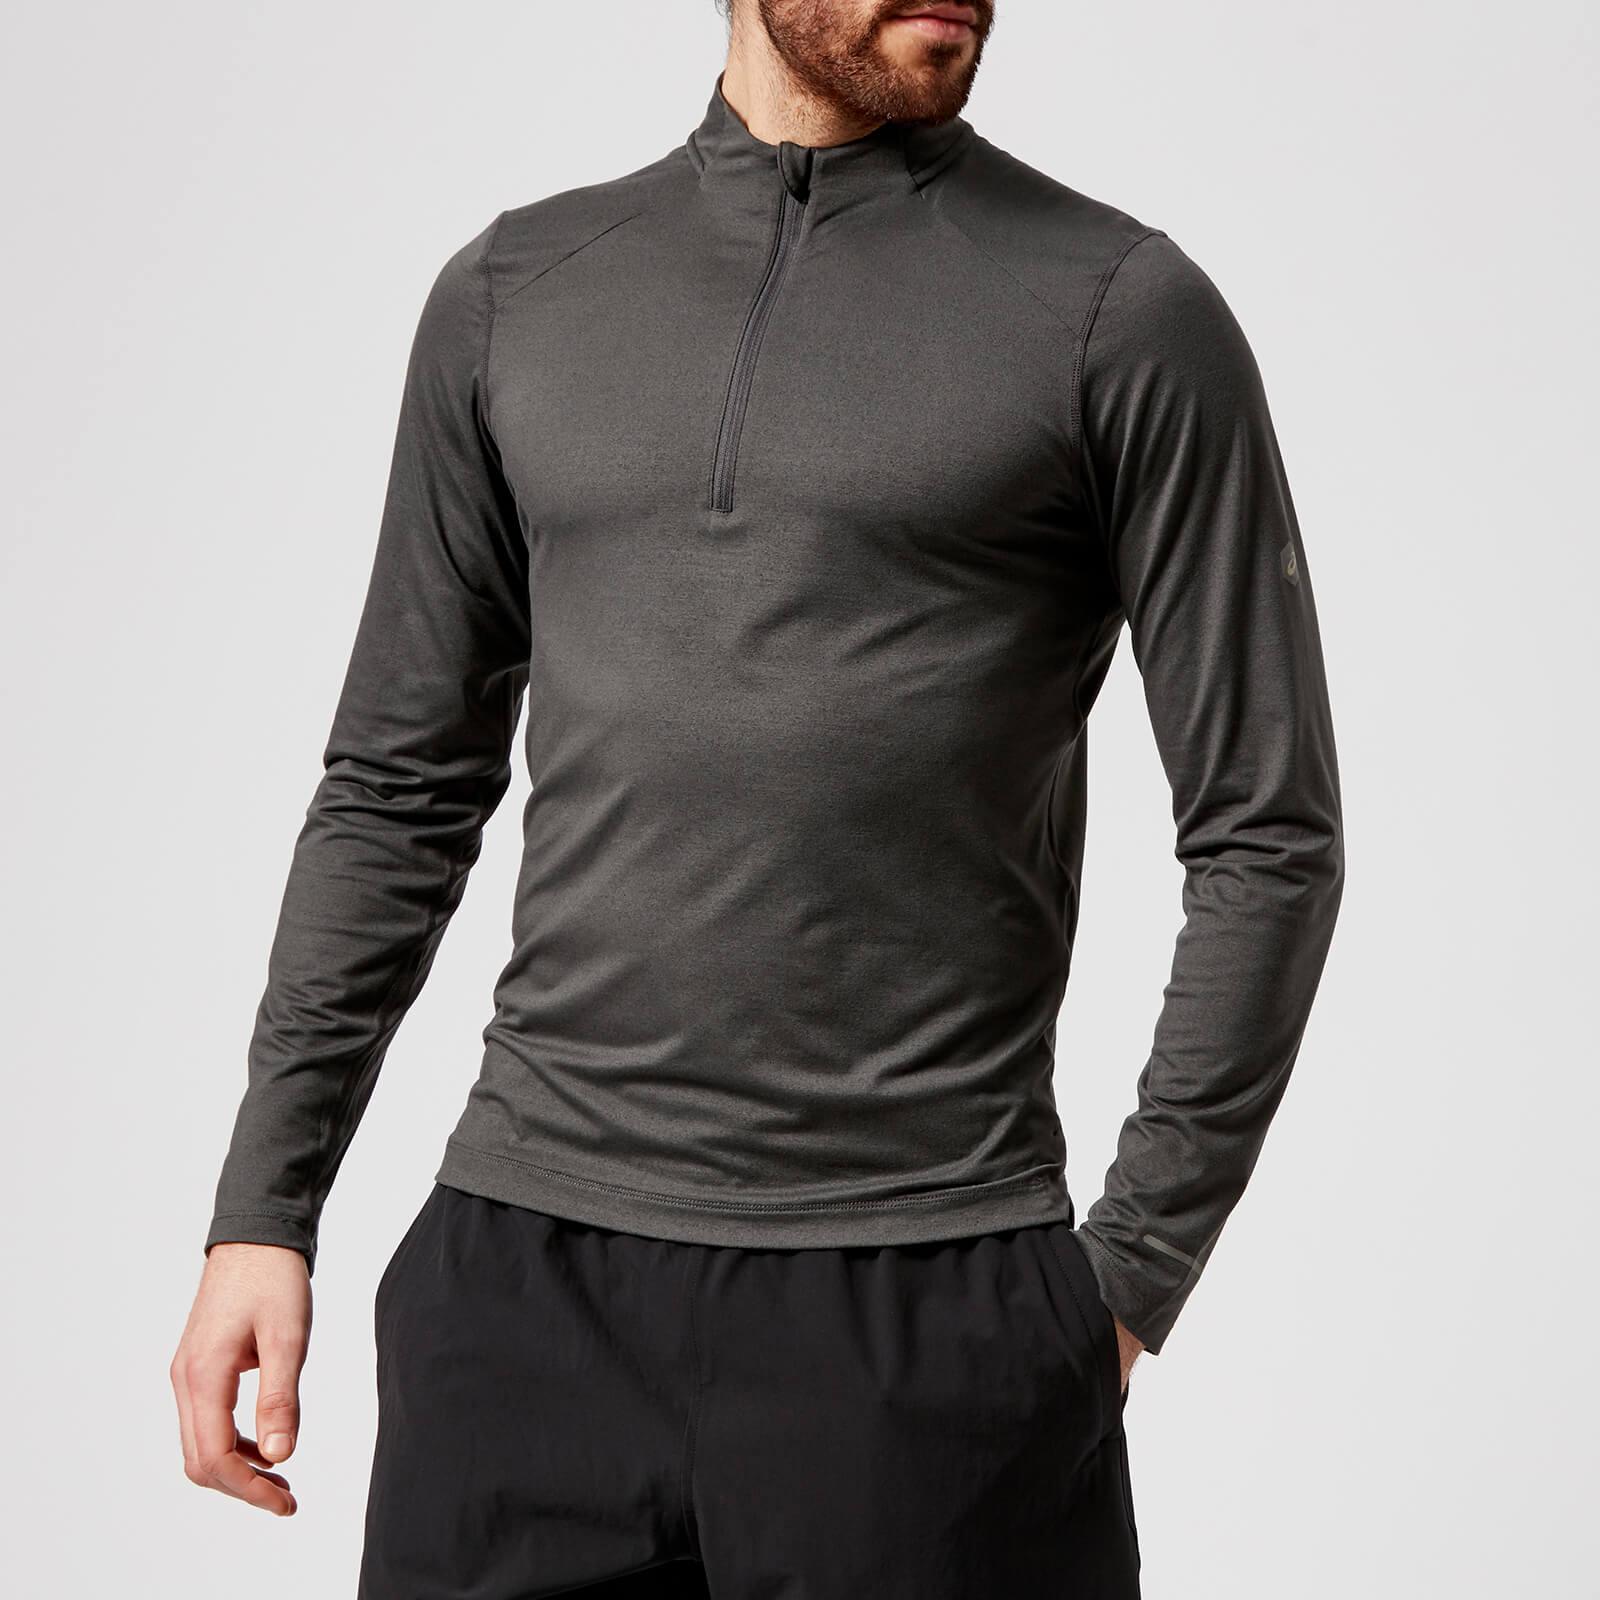 94f6acd6 Asics Running Men's Long Sleeve 1/2 Zip Jersey Top - Dark Grey Heather